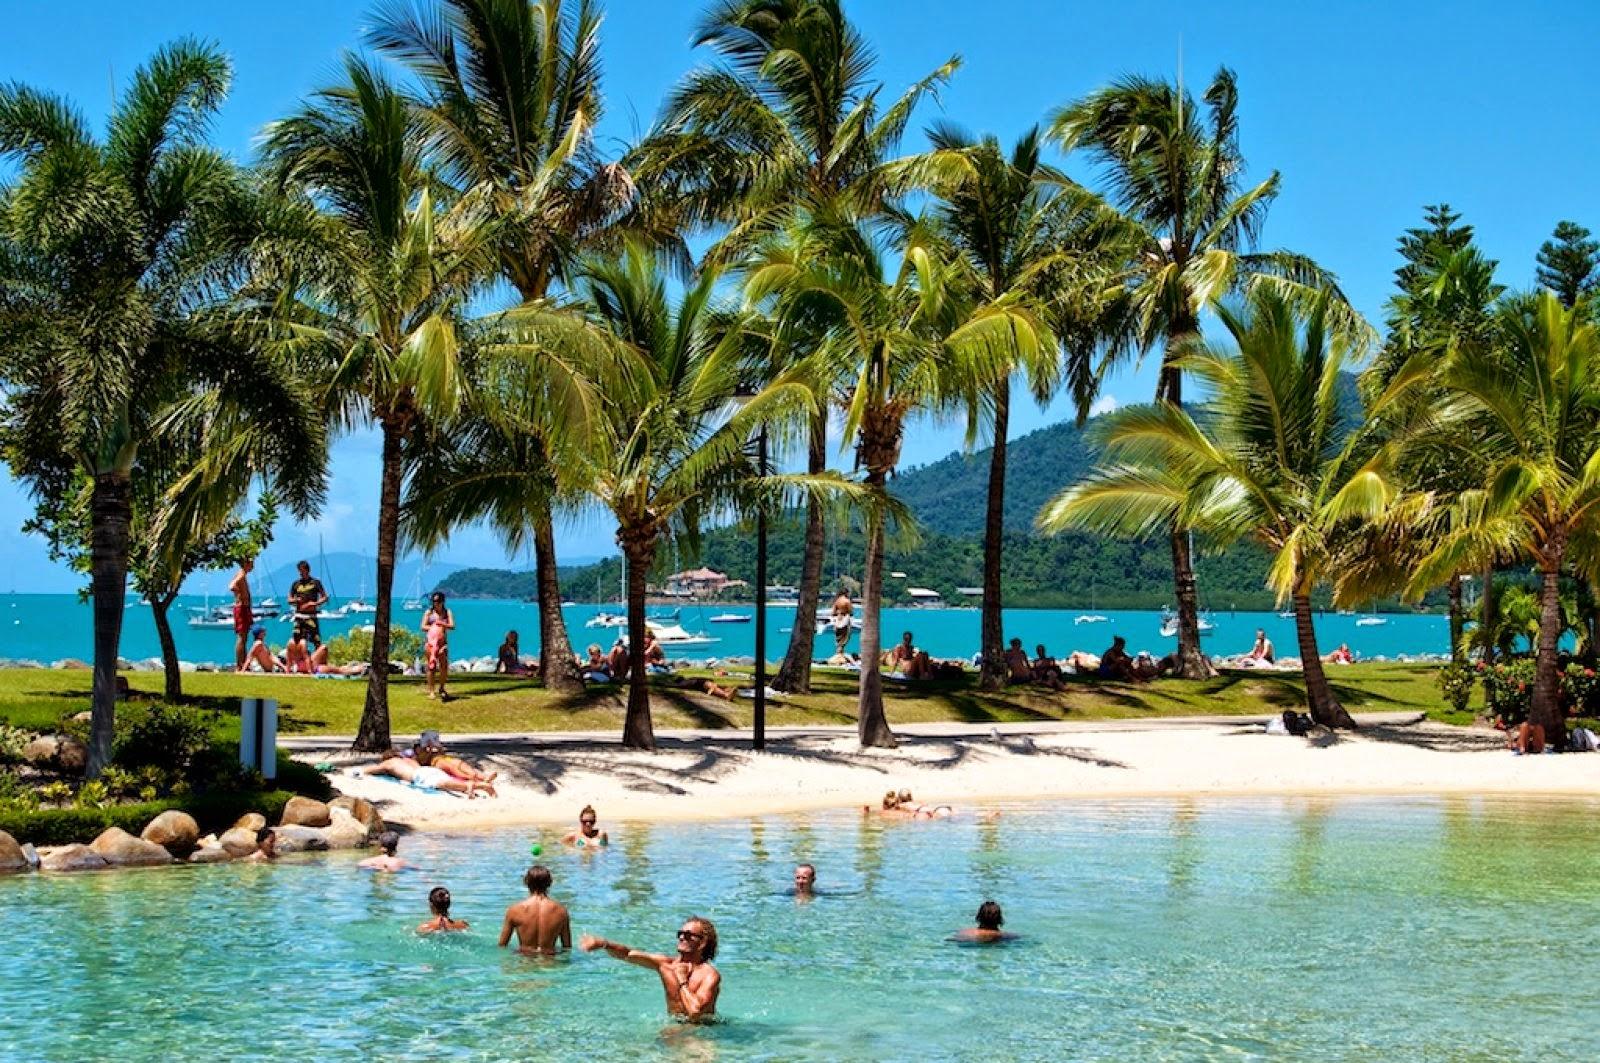 Best Island in Australia, Awesome Island in Australia, Airlie Beach, Asutralia.